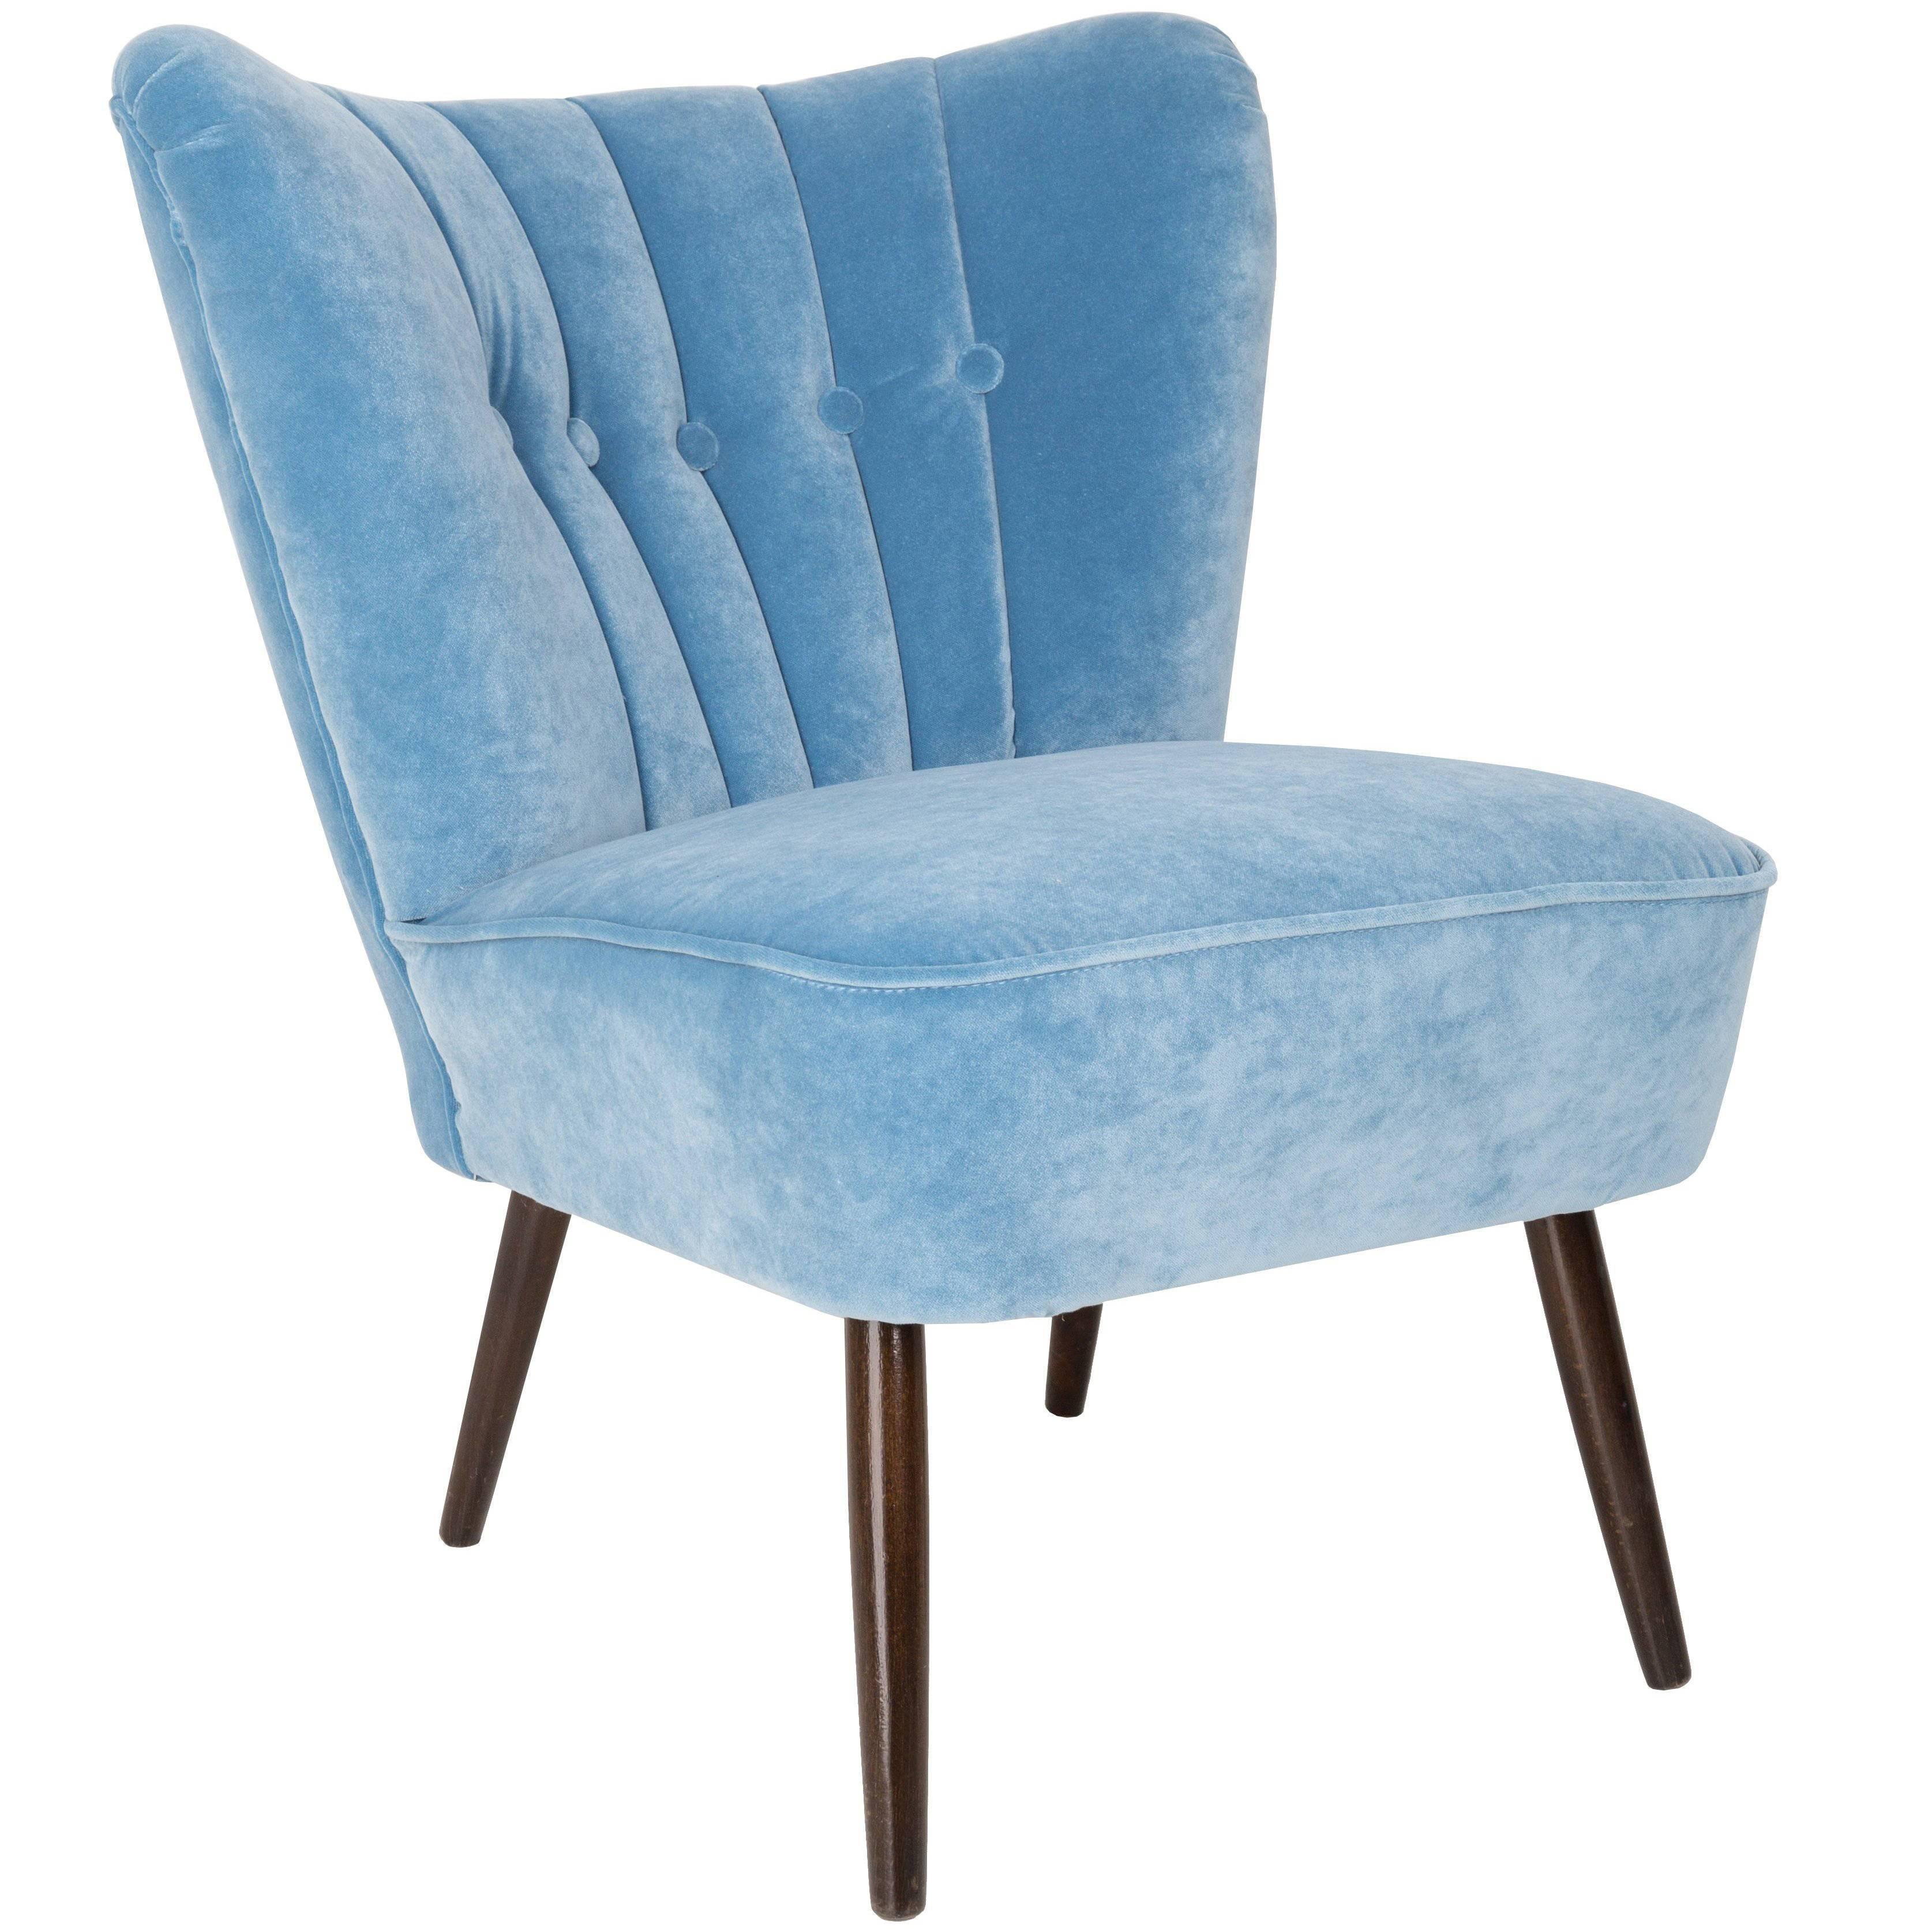 Midcentury Baby Blue Velvet Armchair, Germany, 1960s For Sale